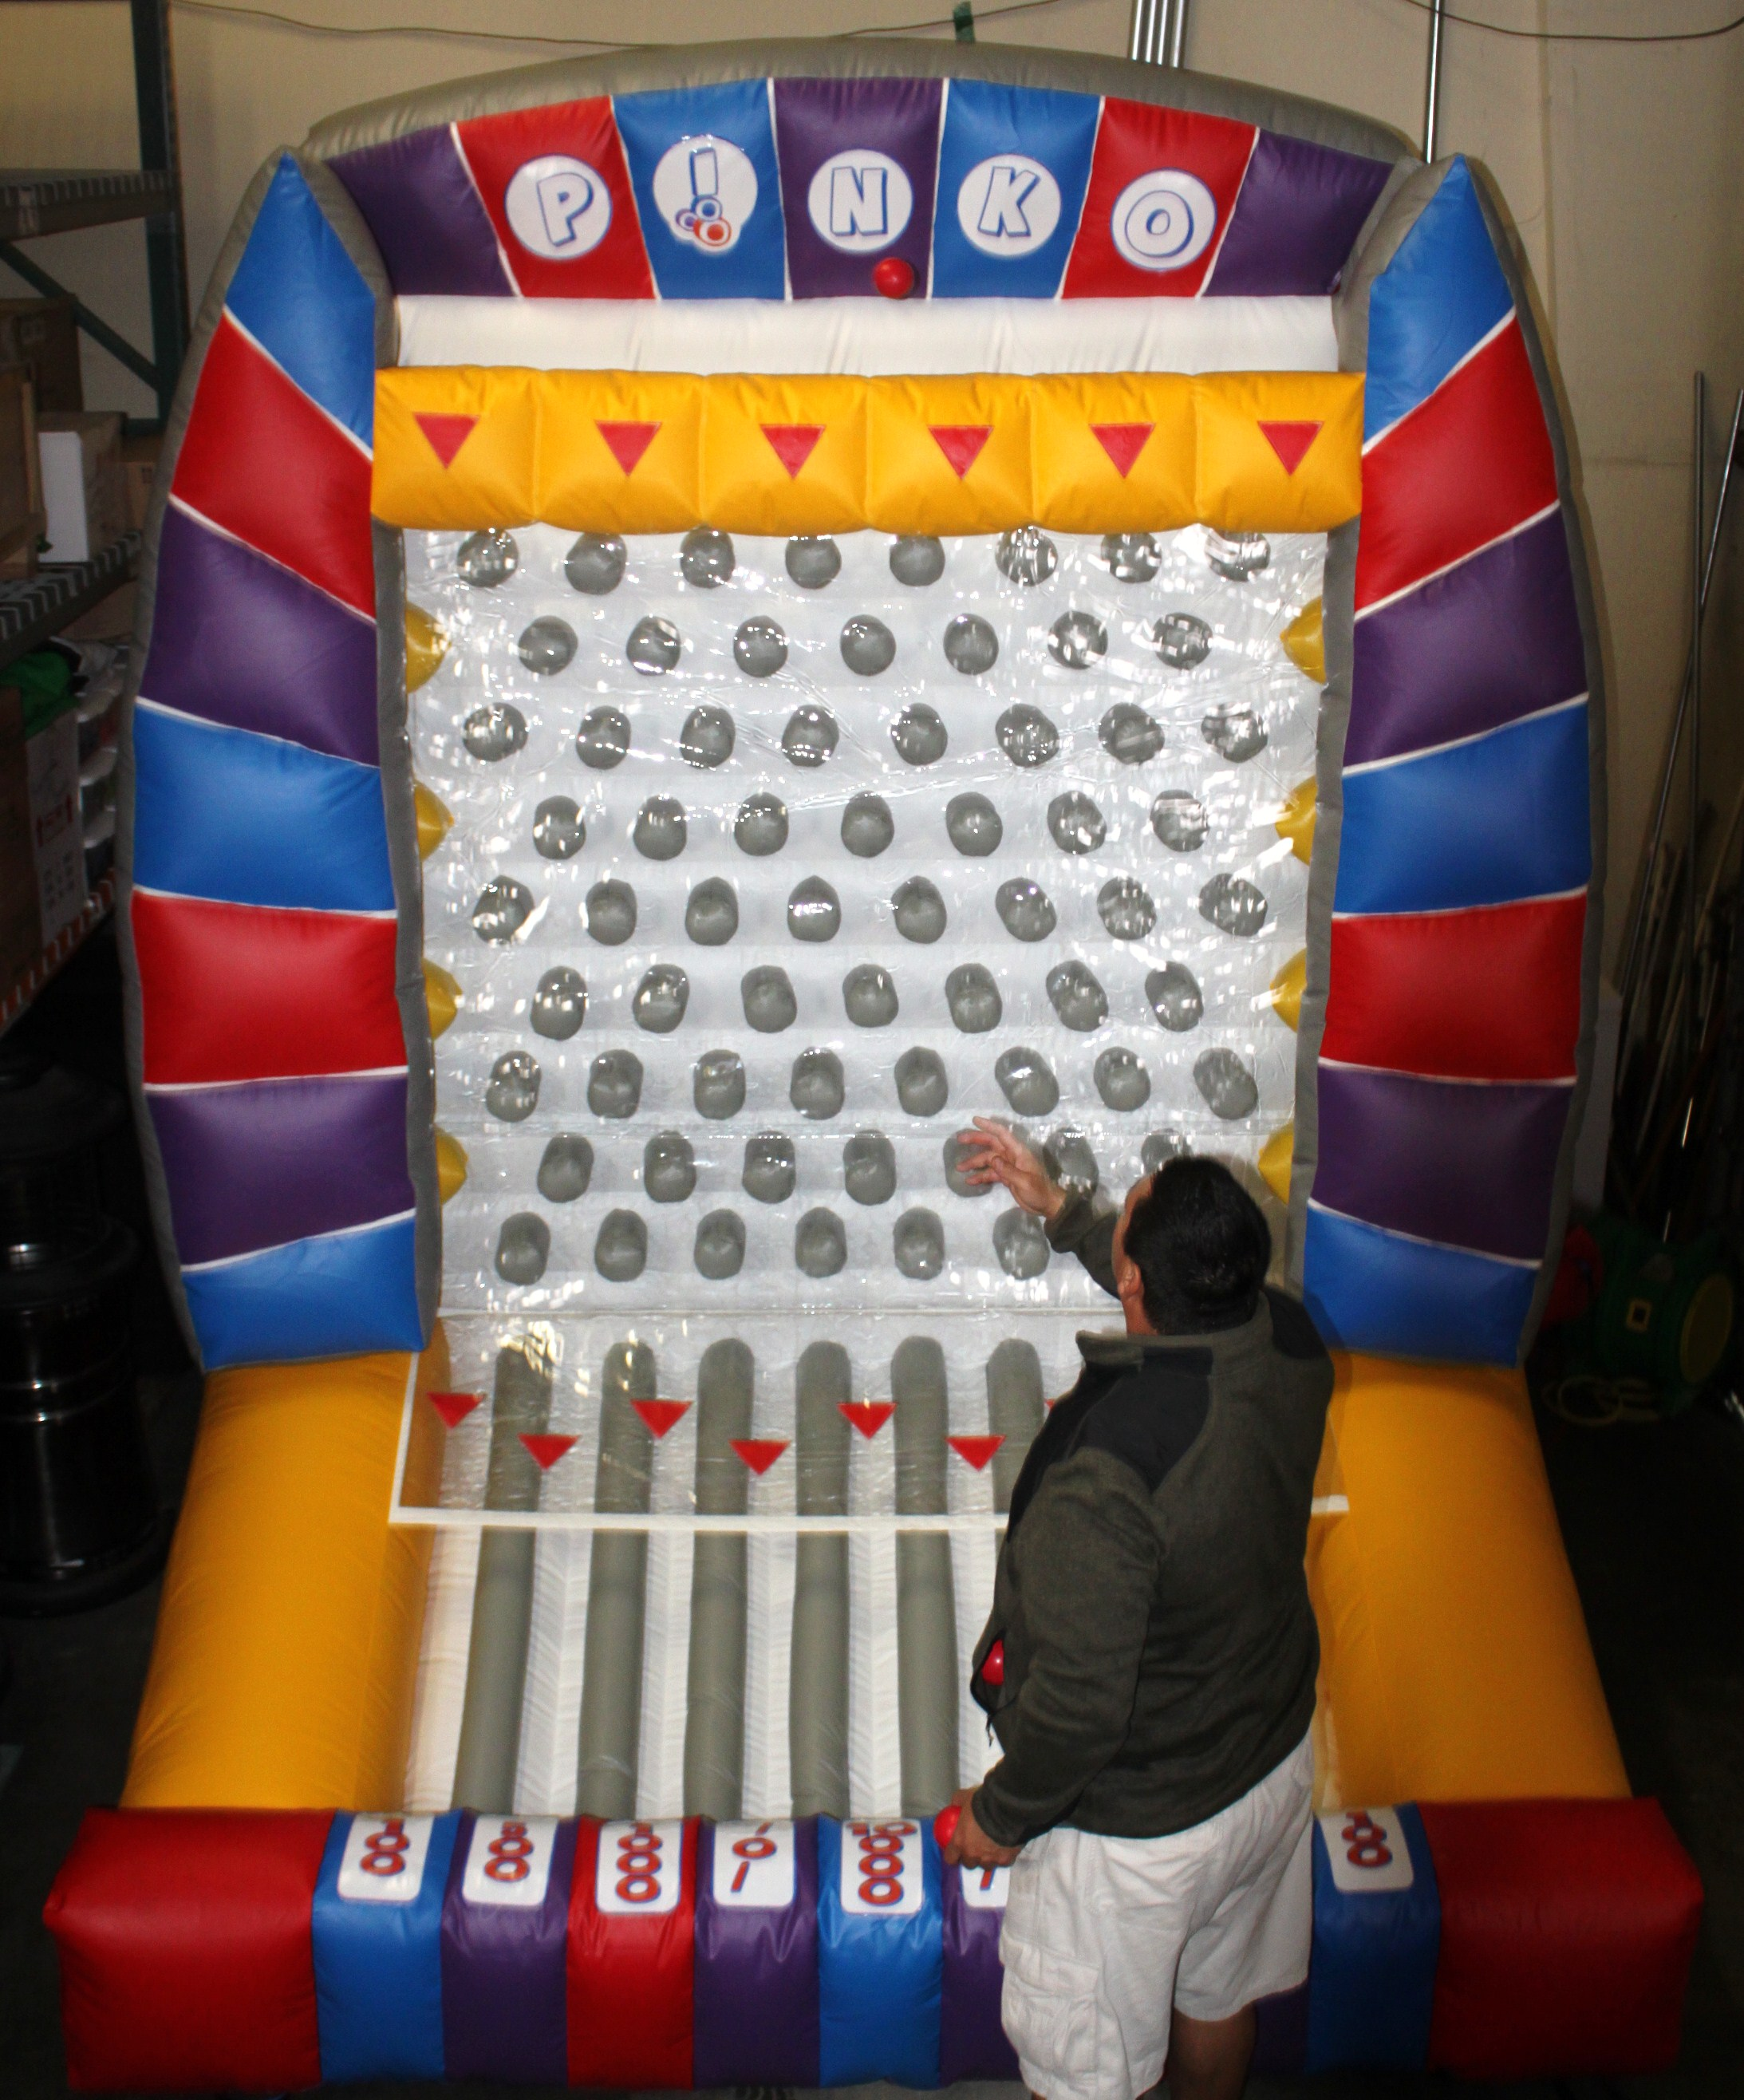 San Jose Car Dealerships >> Inflatable Plinko Game Rental - Lets Party